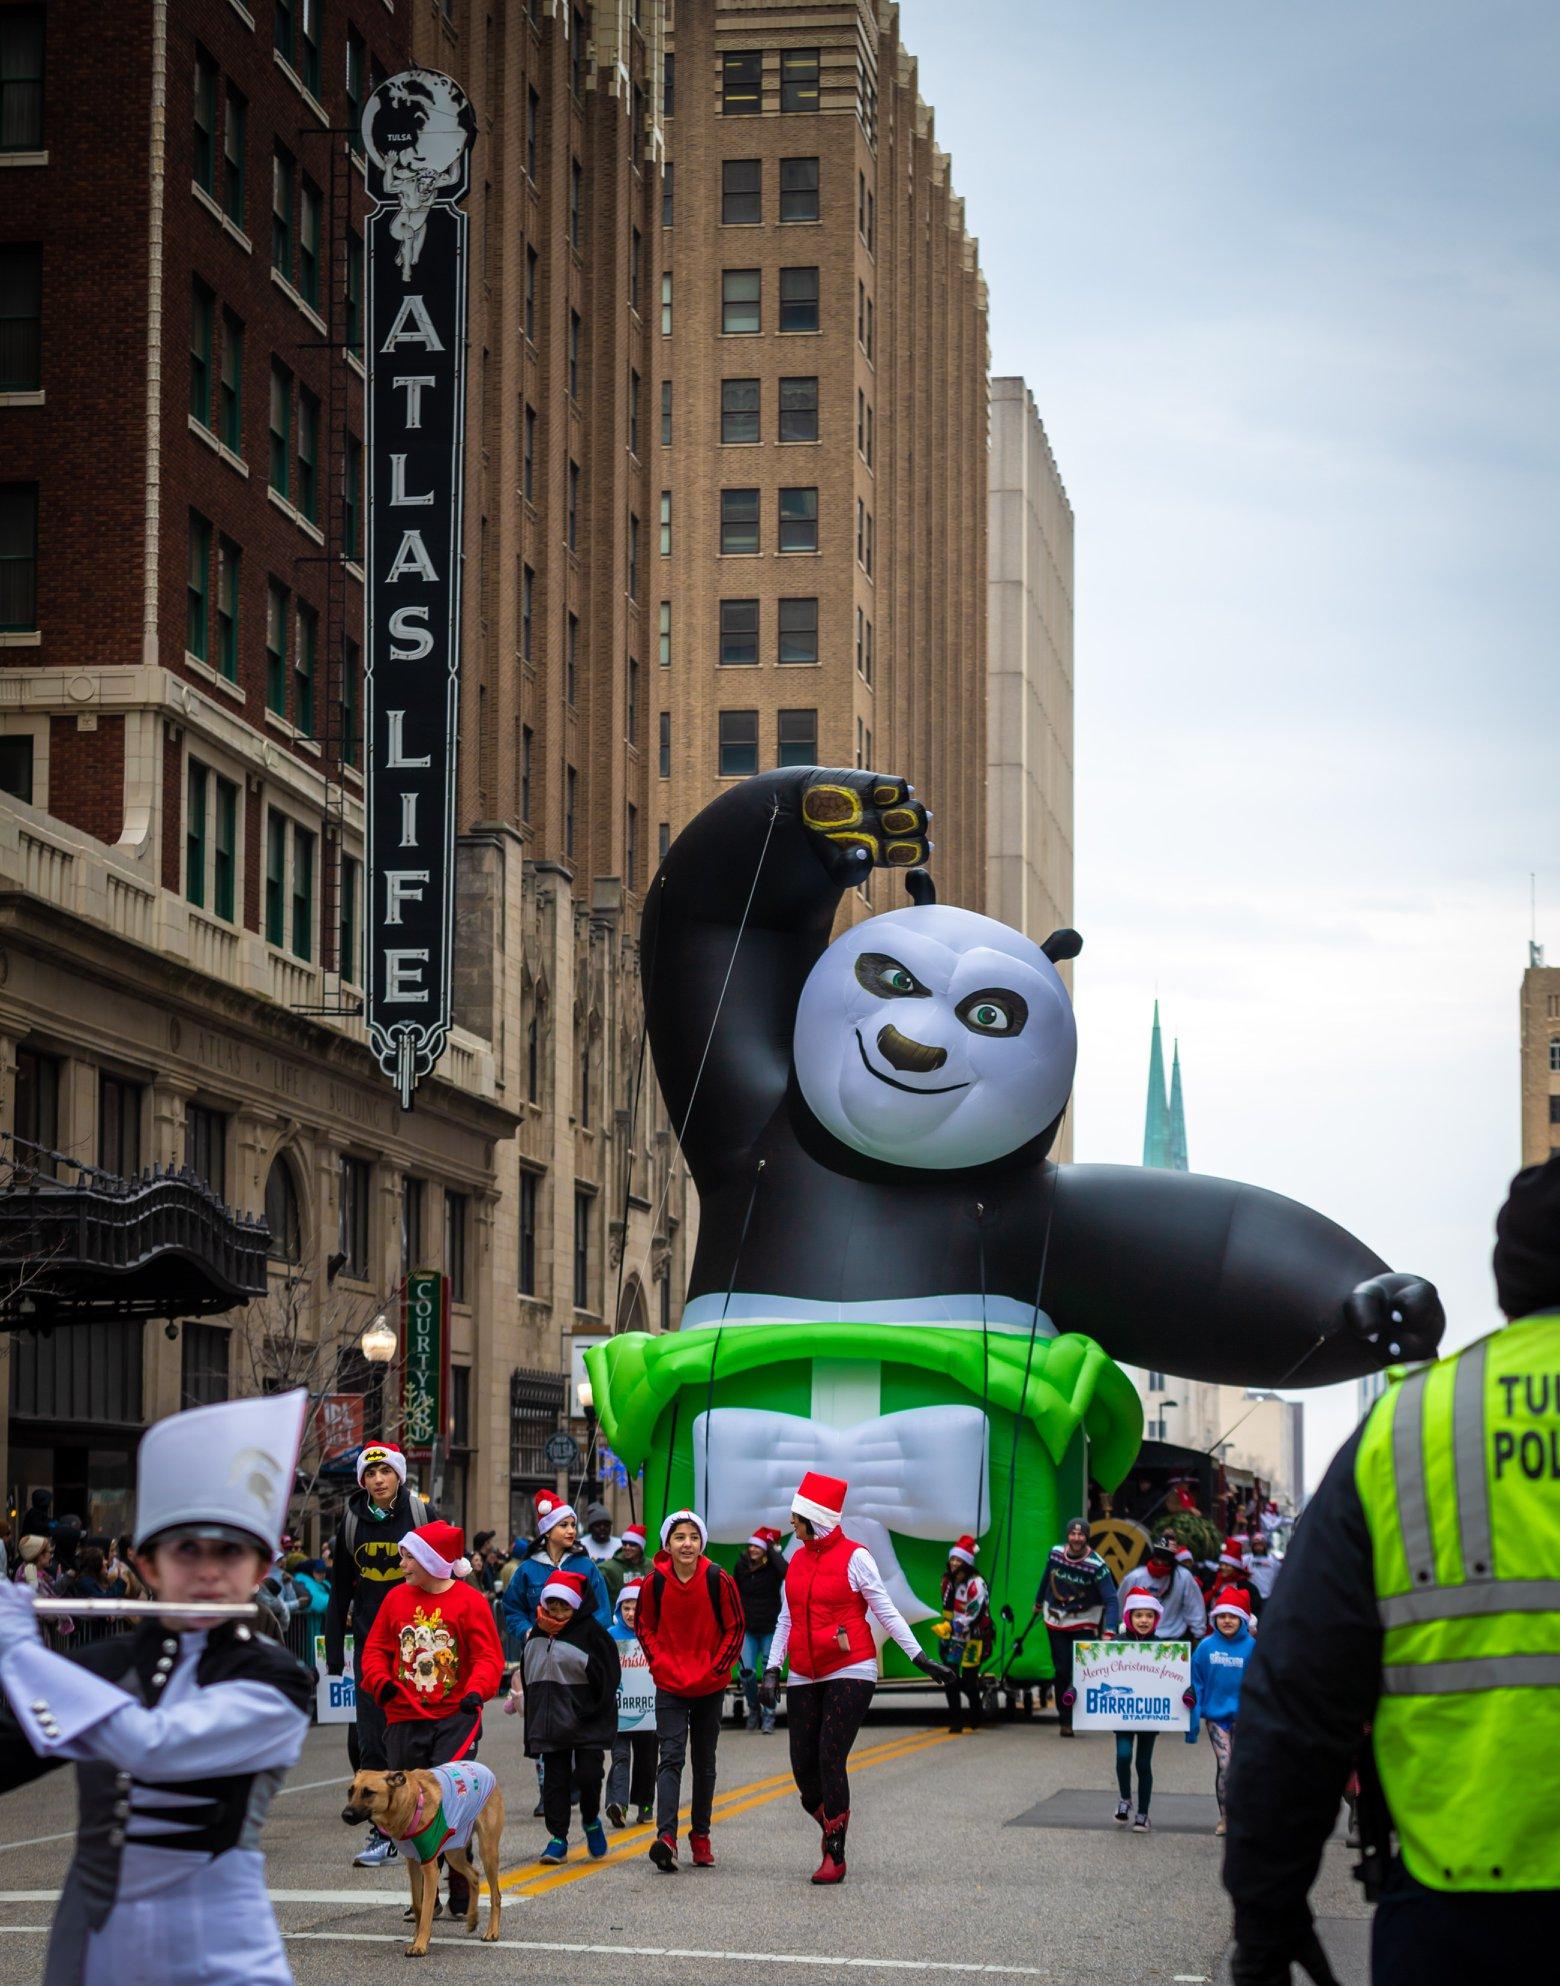 Oklahoma Christmas Parade 2020 Tulsa Makes Plans for 2020 Christmas Parade   FOX 40 WICZ TV